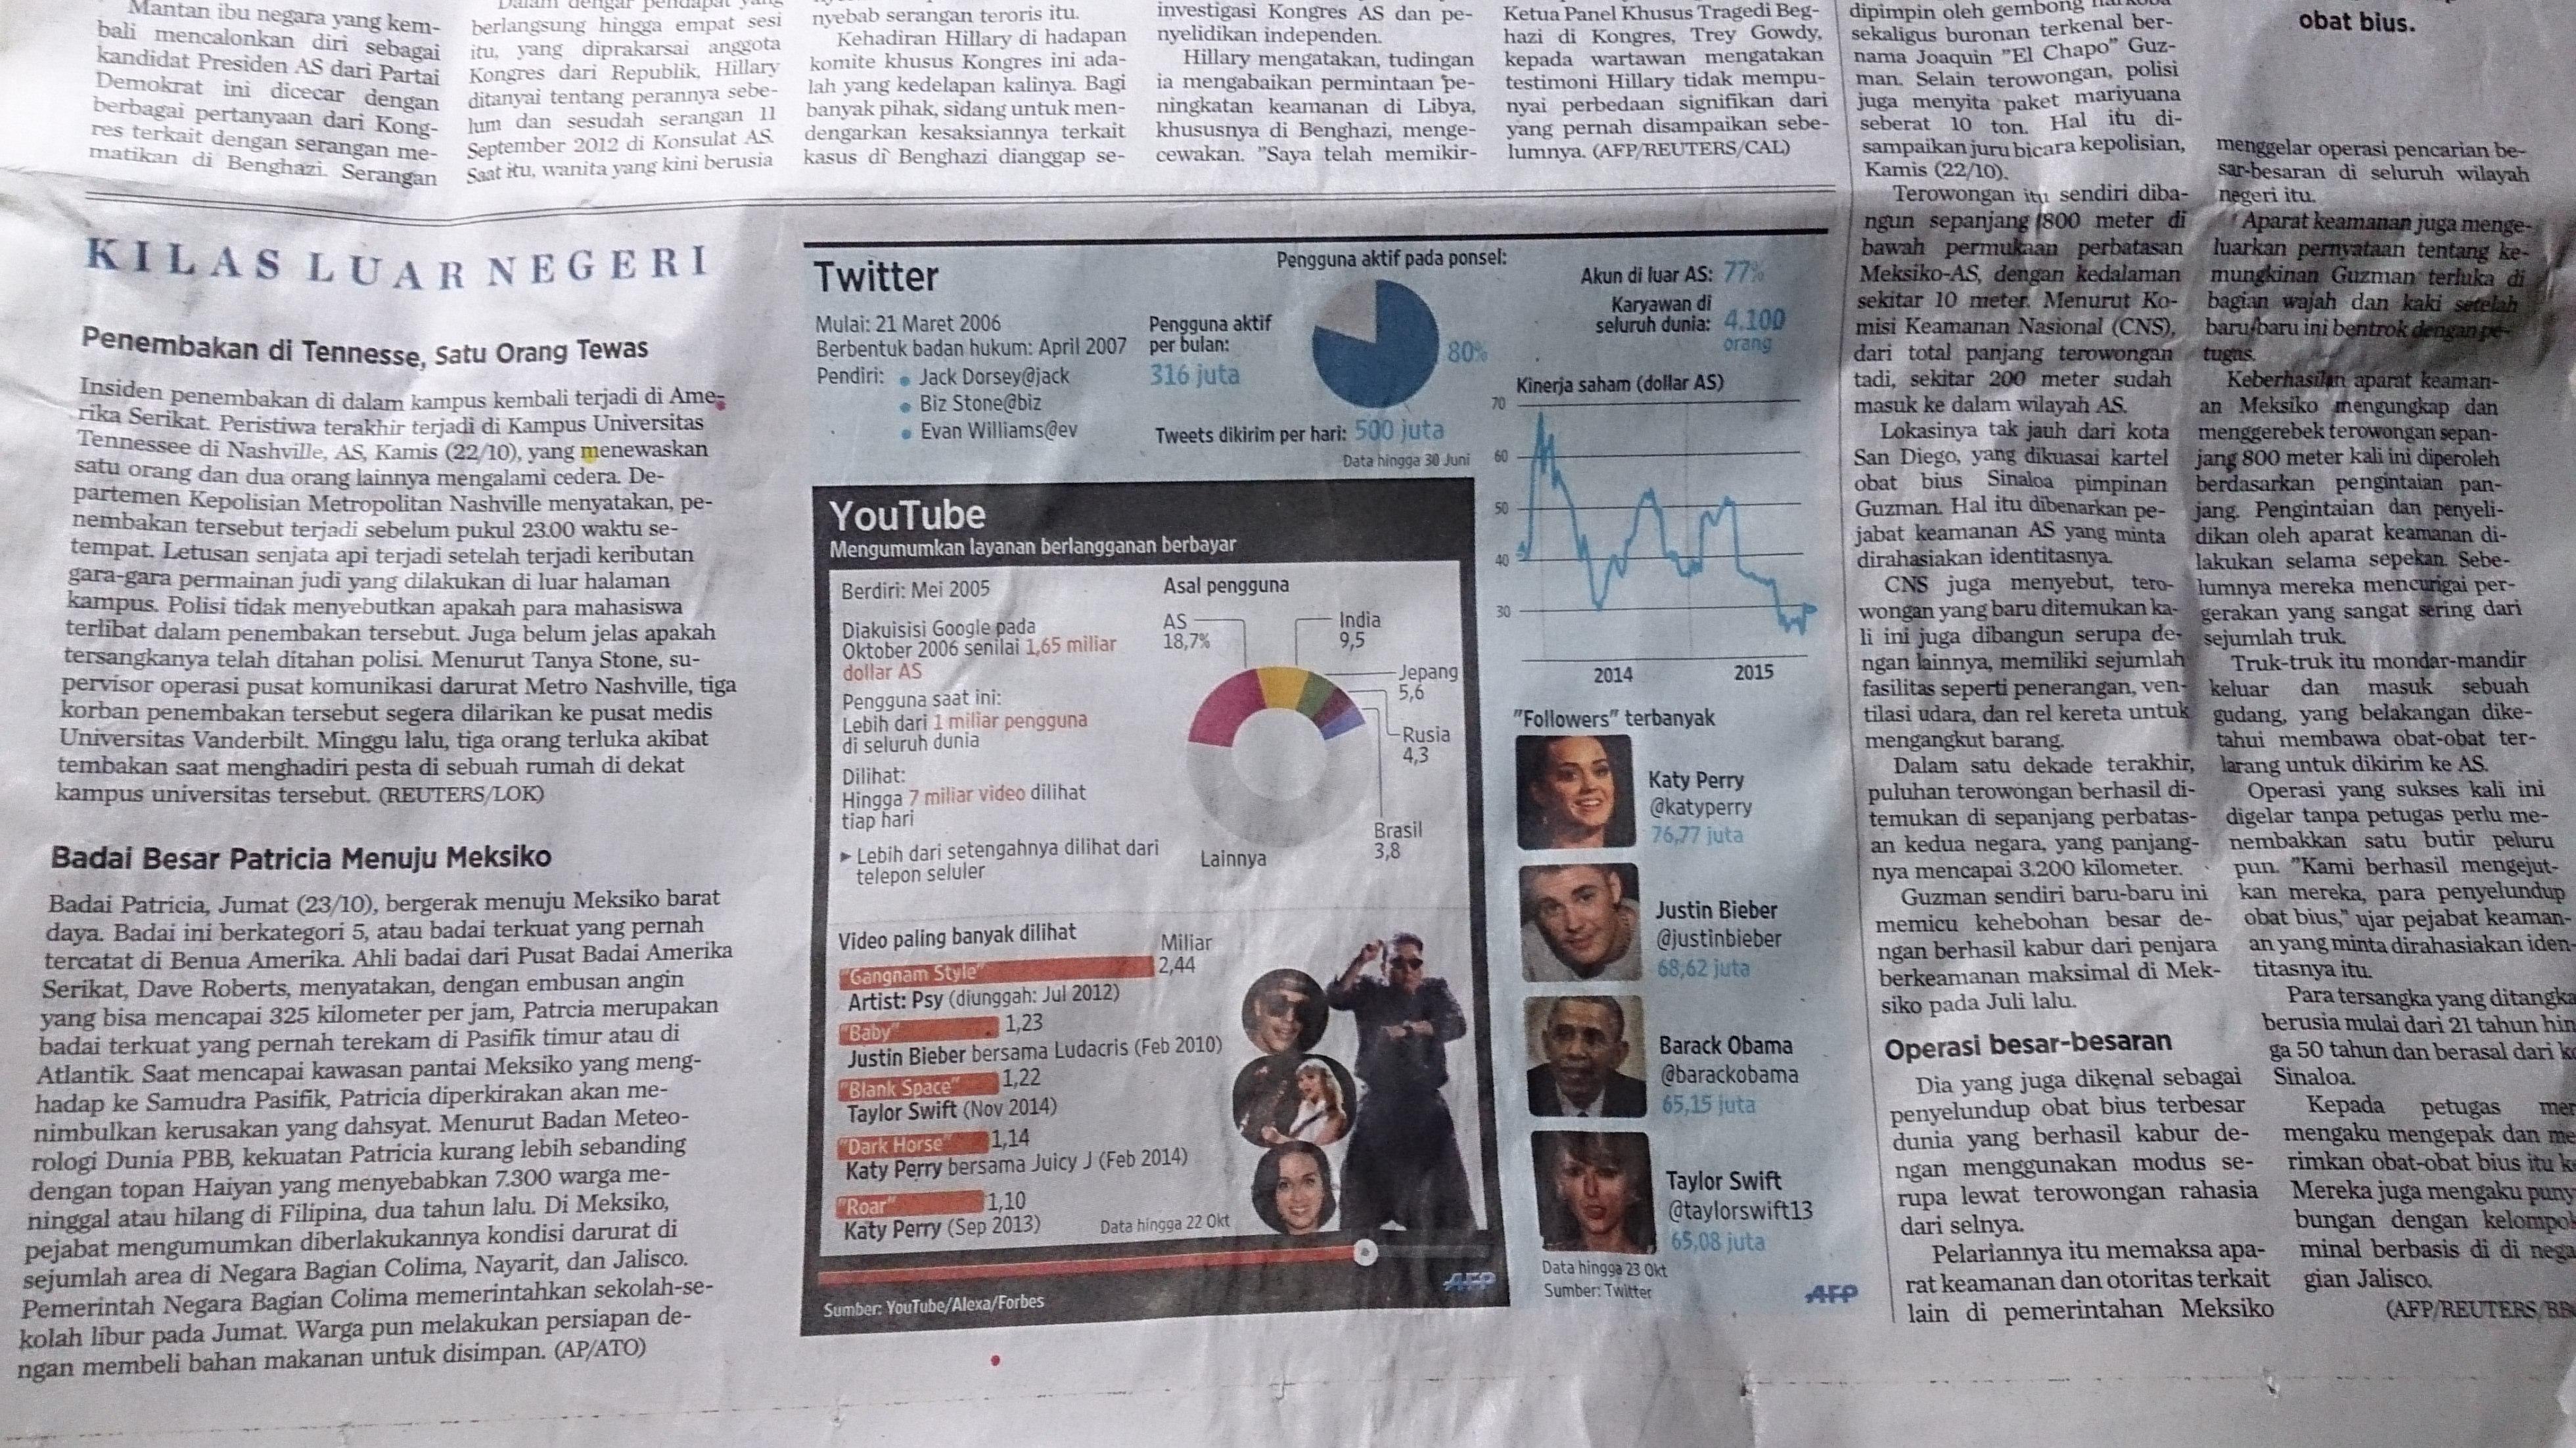 Infografis harian kompas twitter dan youtube oleh anisa novia dokumentasi infografis ccuart Choice Image